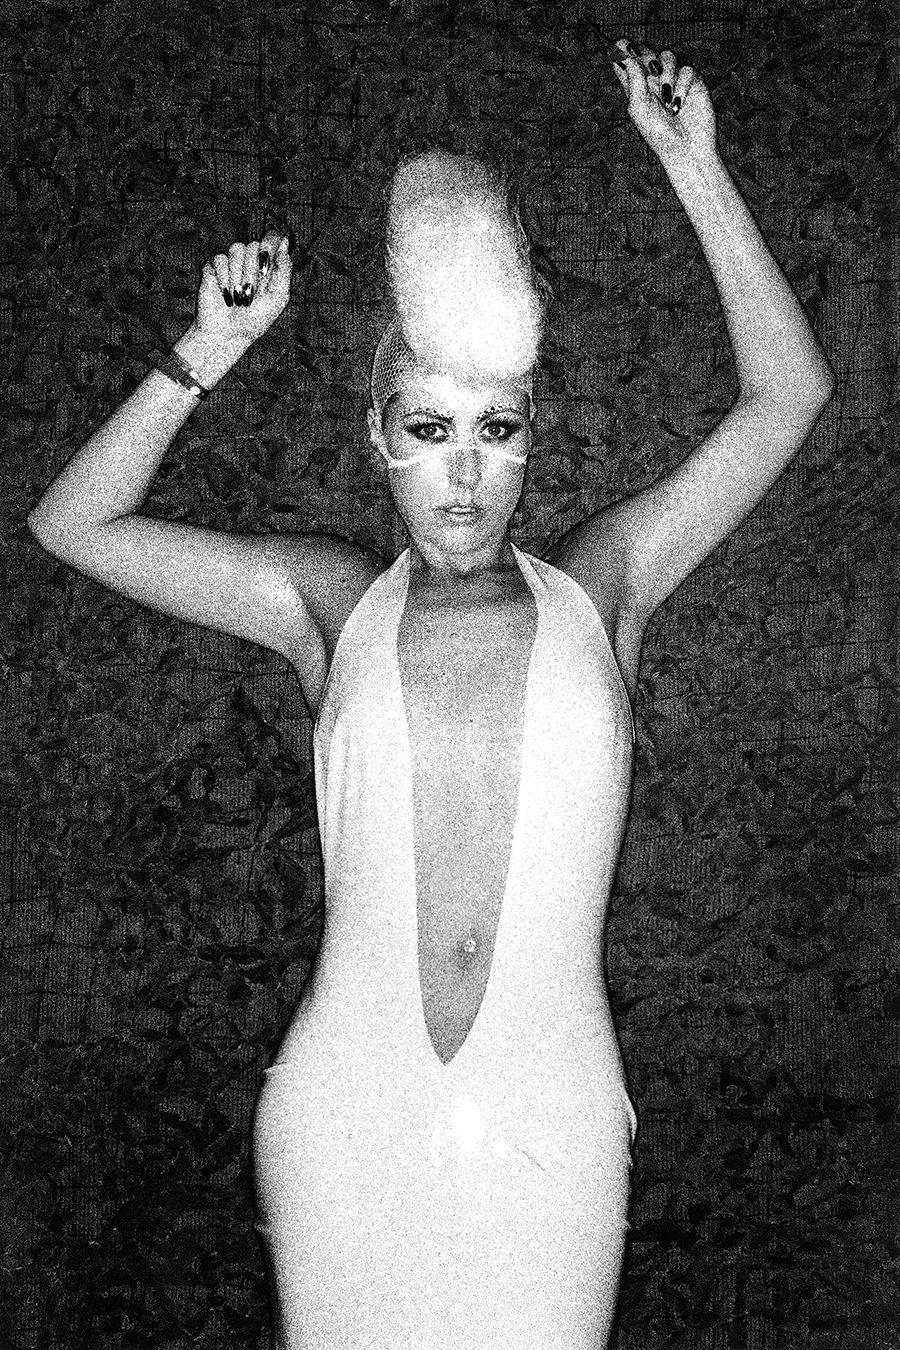 med-Tony_Ward_photography_documentary_wasteland_party_amsterdam_netherlands_fetish_bondage_fashion_erotica_kink_porn_lust_piercings_gay_straight_dance_music_fun_international_parties_transgender_Josslein_3-R